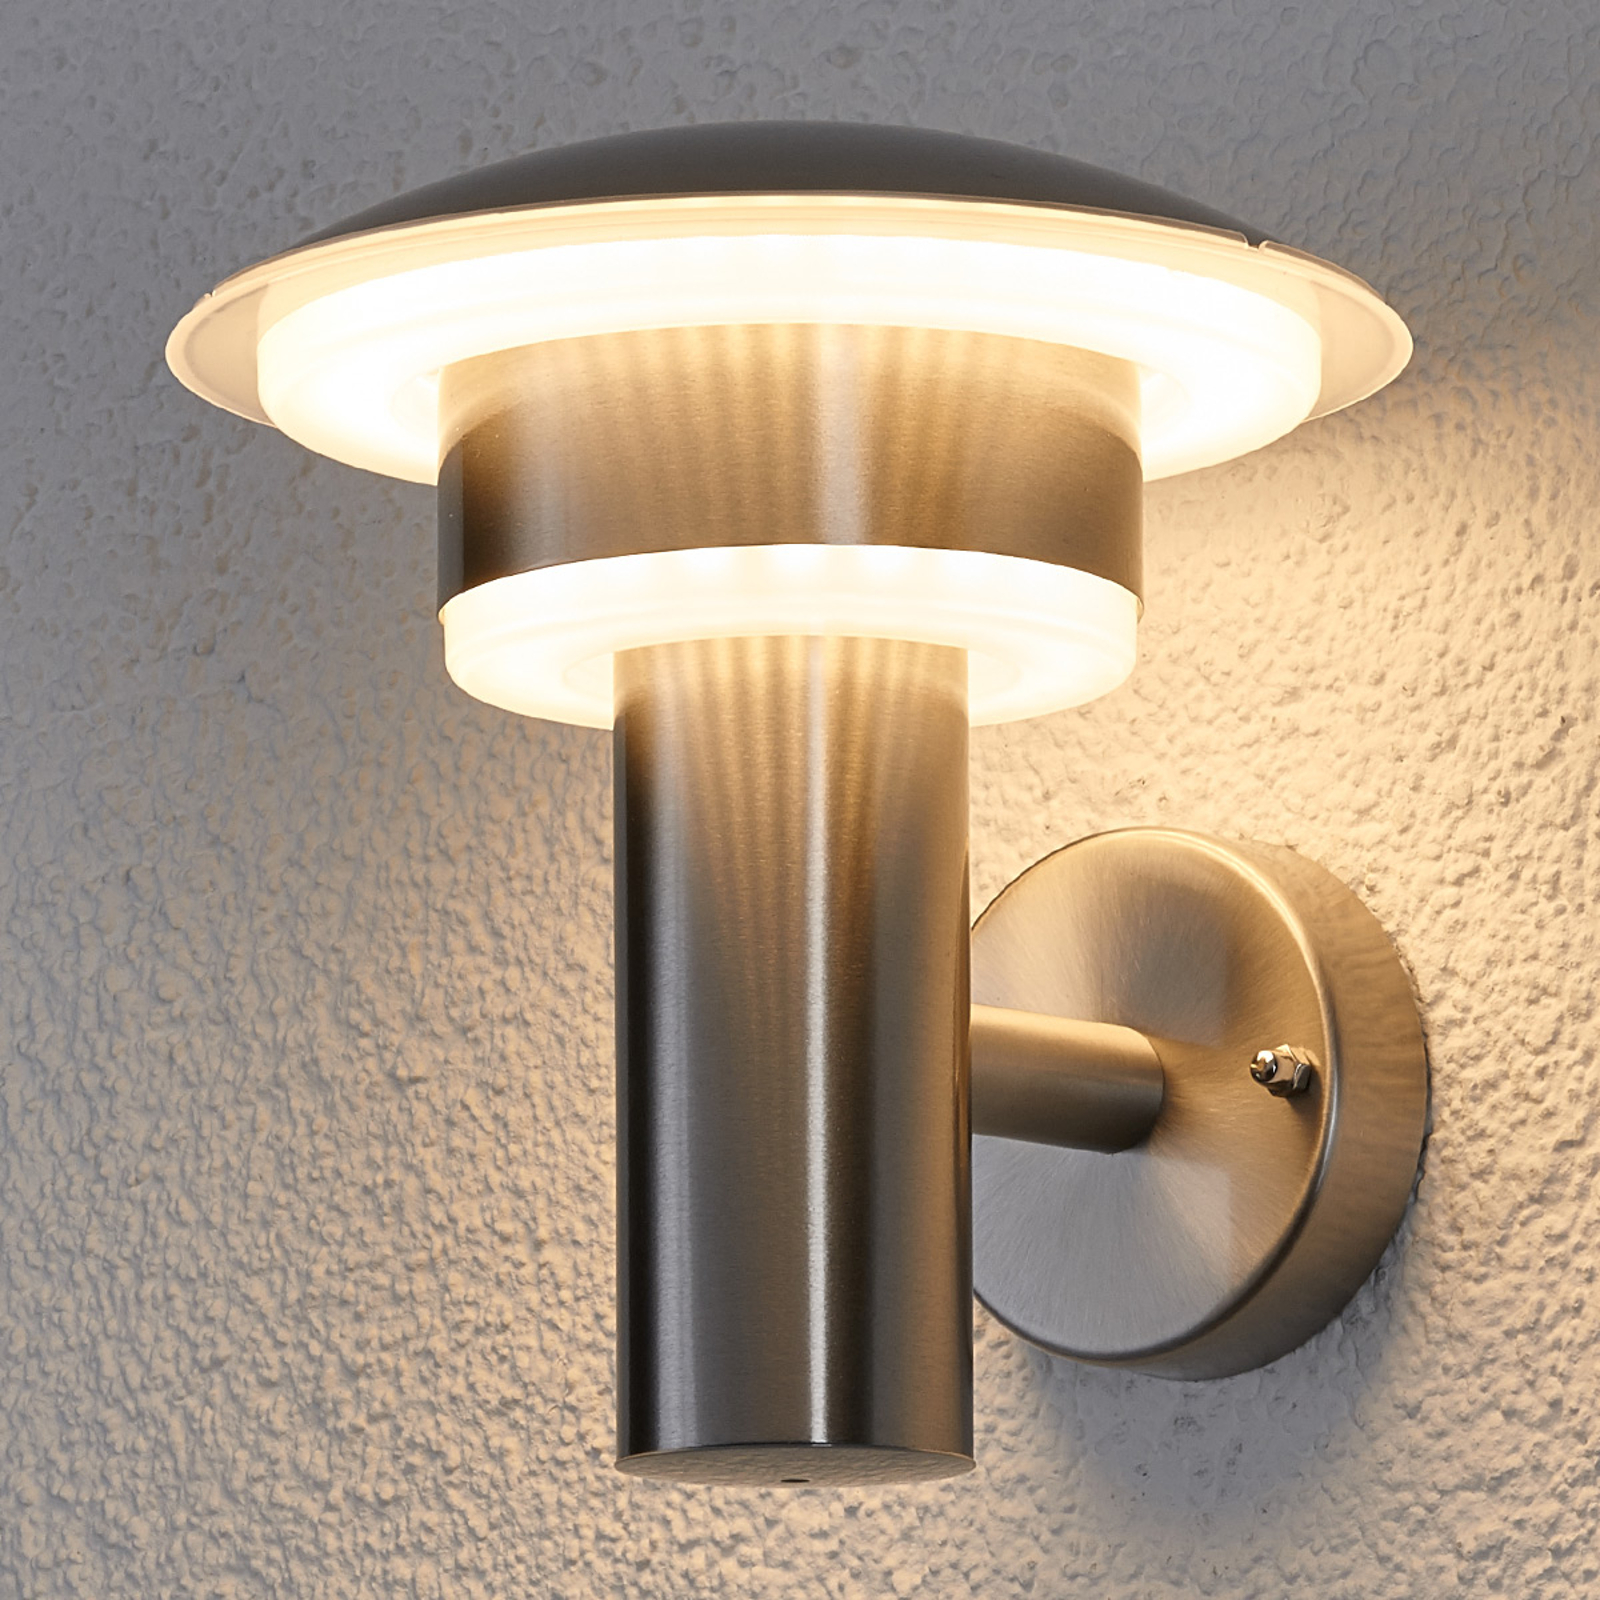 Dekorativt LED-utevegglys Lillie i rustfritt stål